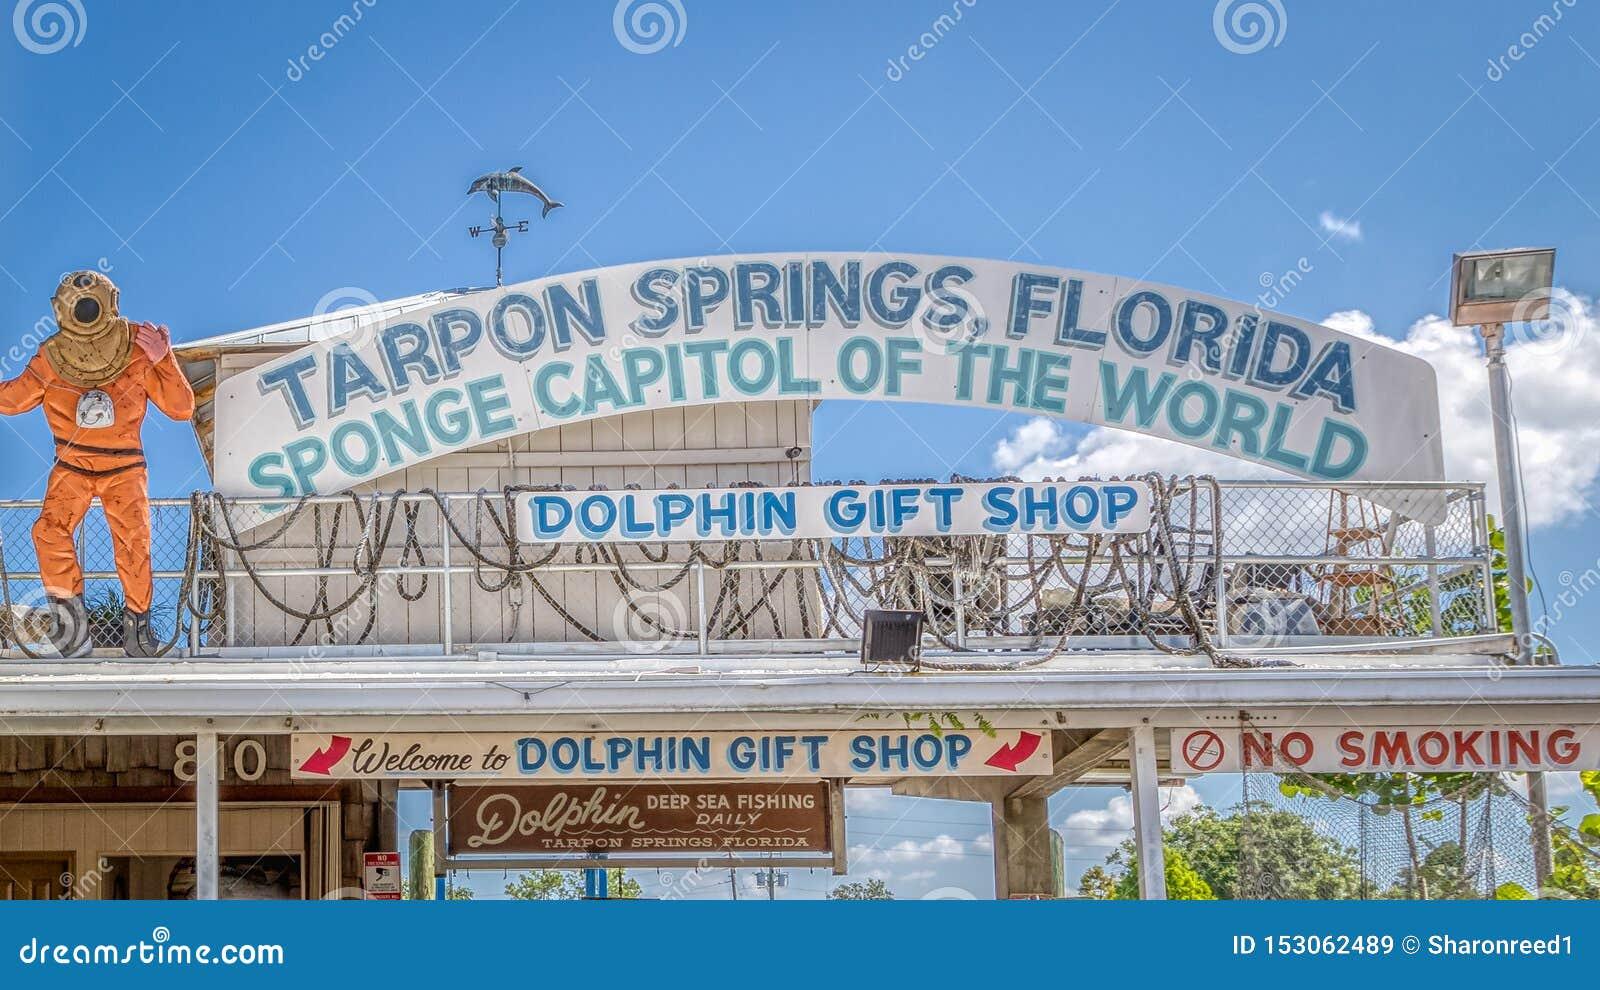 TARPON SPRINGS, FLORIDA - JUNE 30, 2019: Sponge capital of the world Dolphin gift shop sign